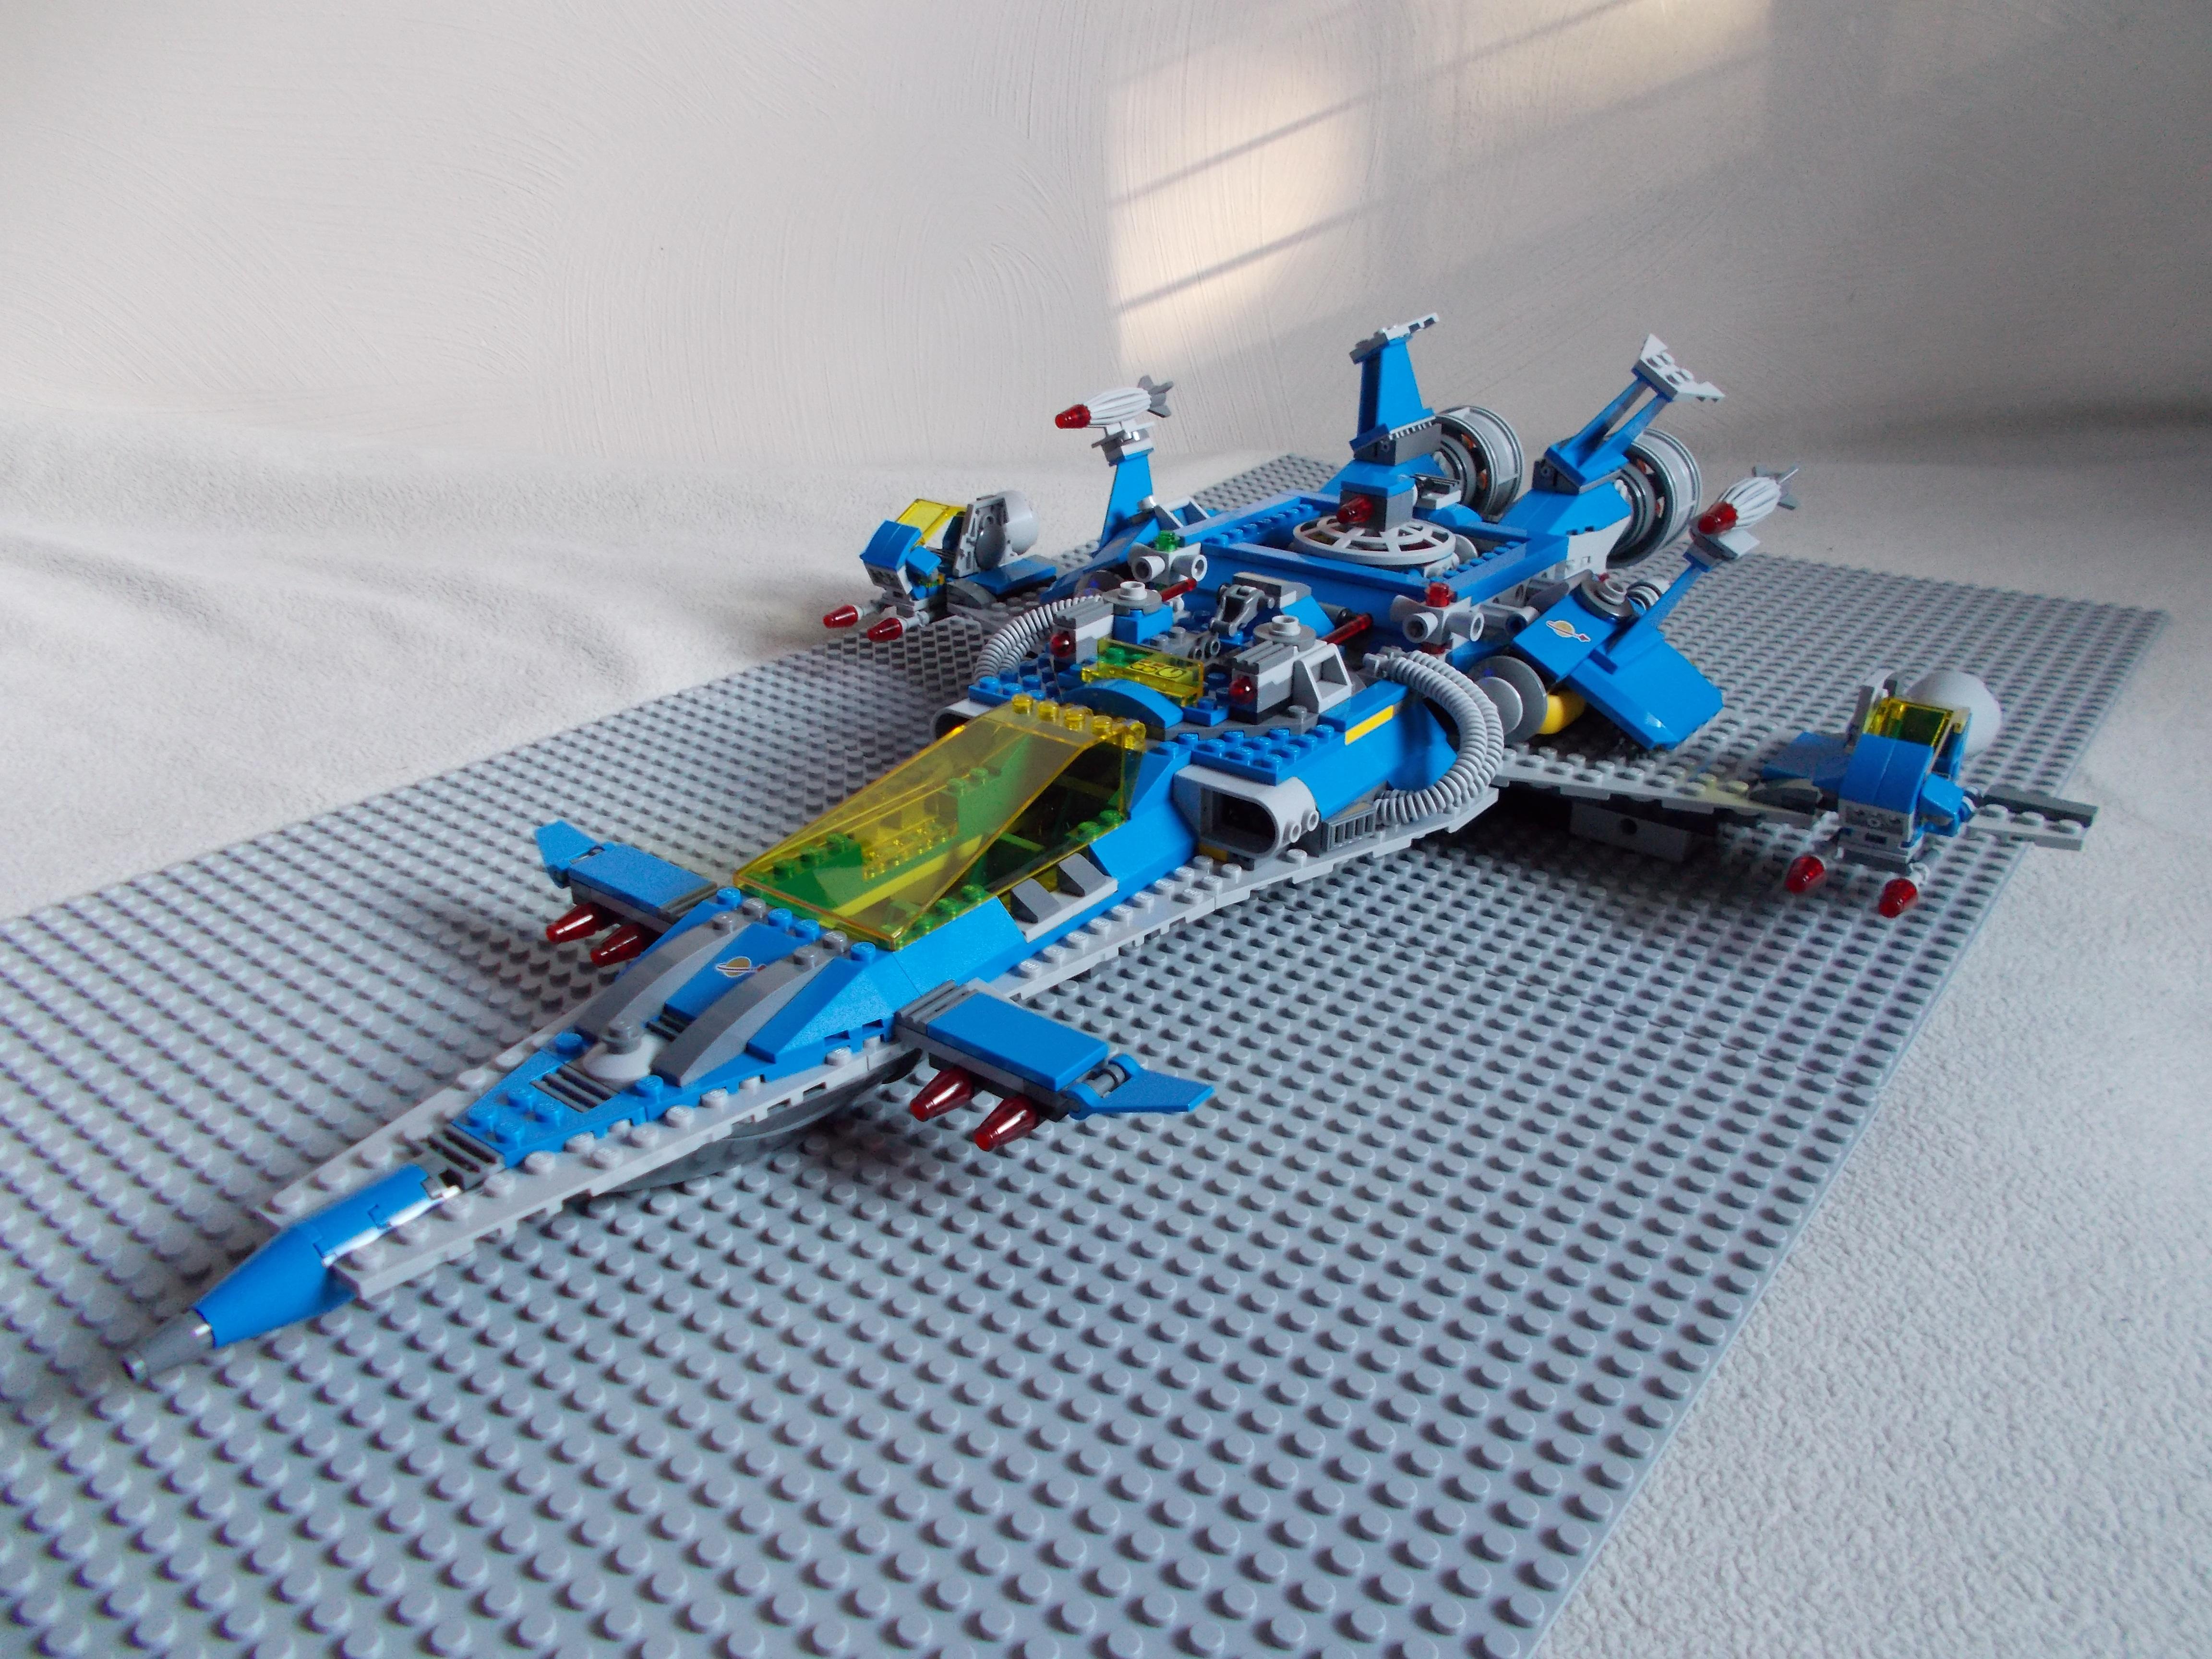 T.L.M. ''Benny's Spaceship Spaceship SPACESHIP'' by DanteZX